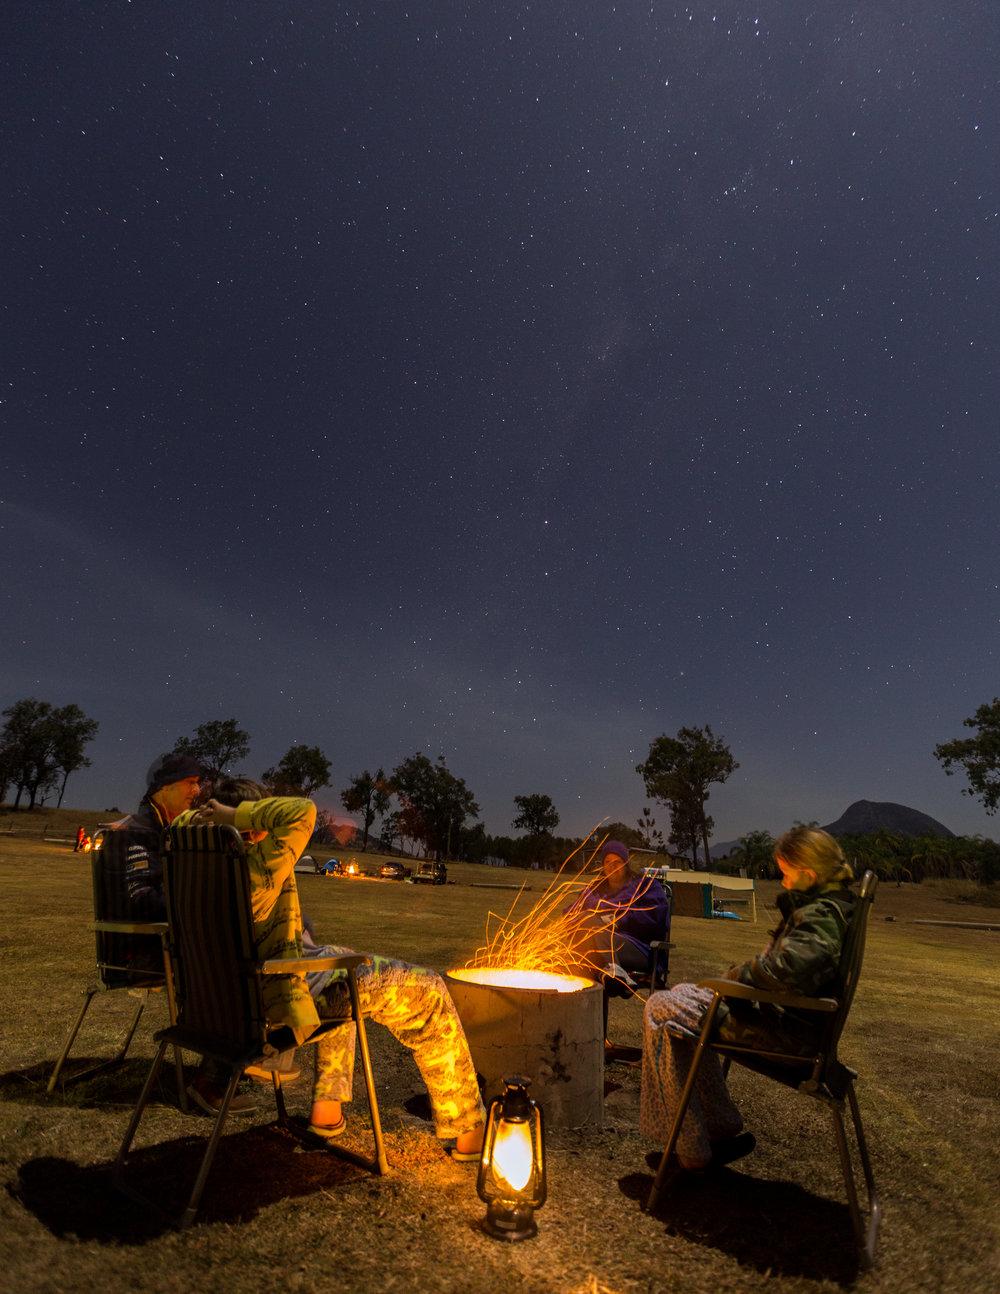 First night around the campfire